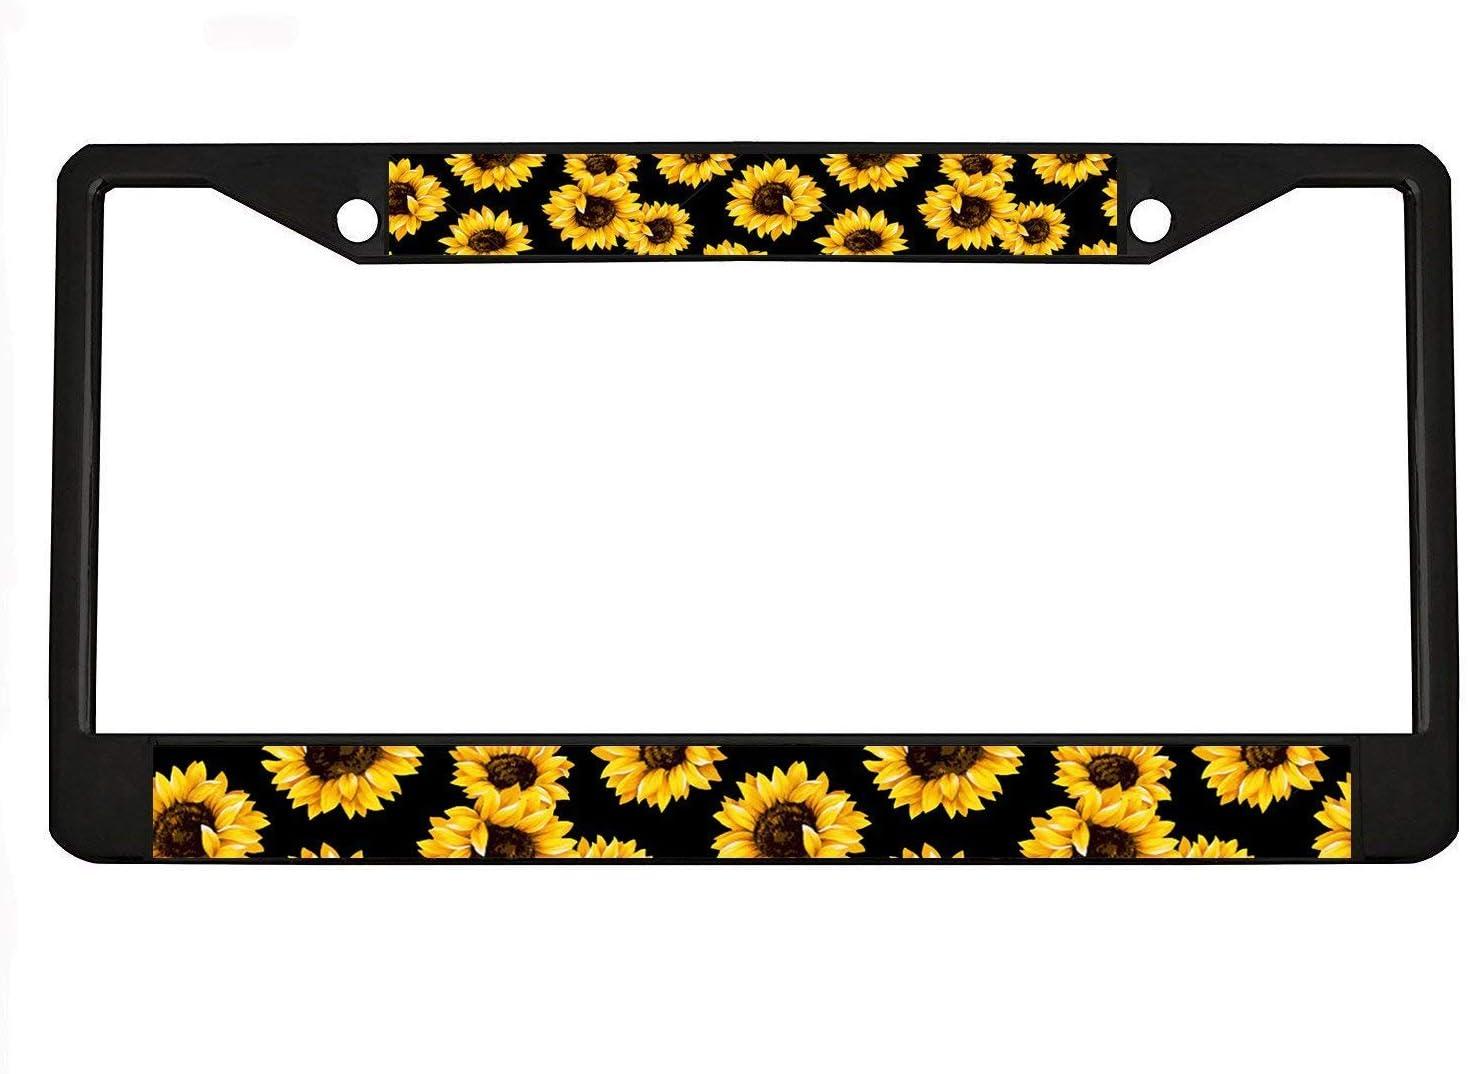 for Women Men 12x6 UTF4C Car License Plate Frame Sunflowers Metal Auto Covers